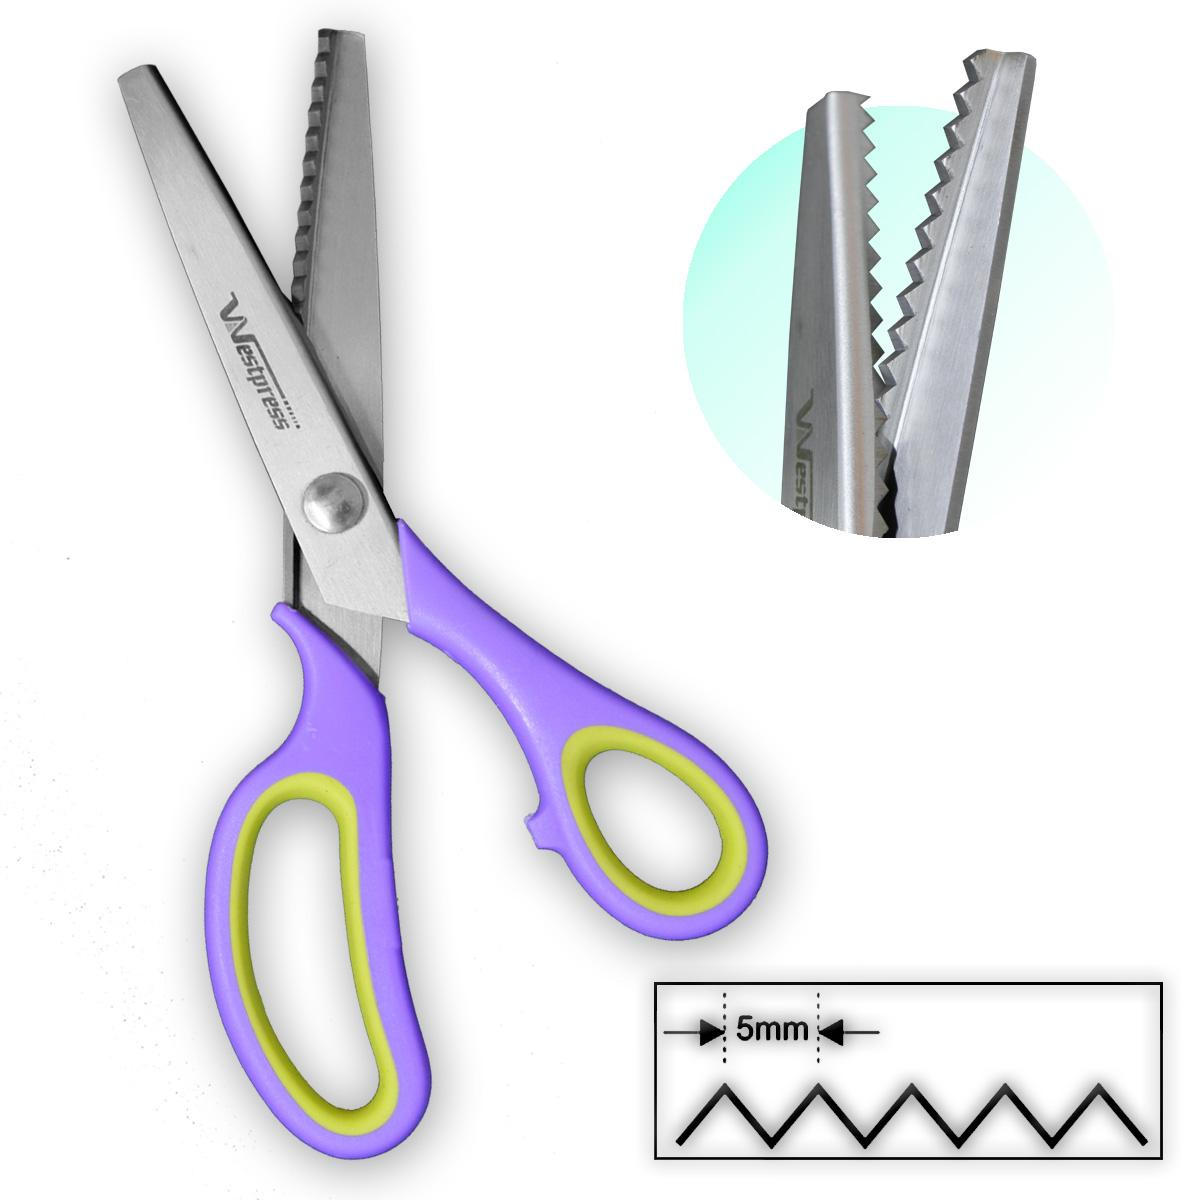 Tesoura Profissional Picotar Corta Tecido Papel Zig Zag 5mm